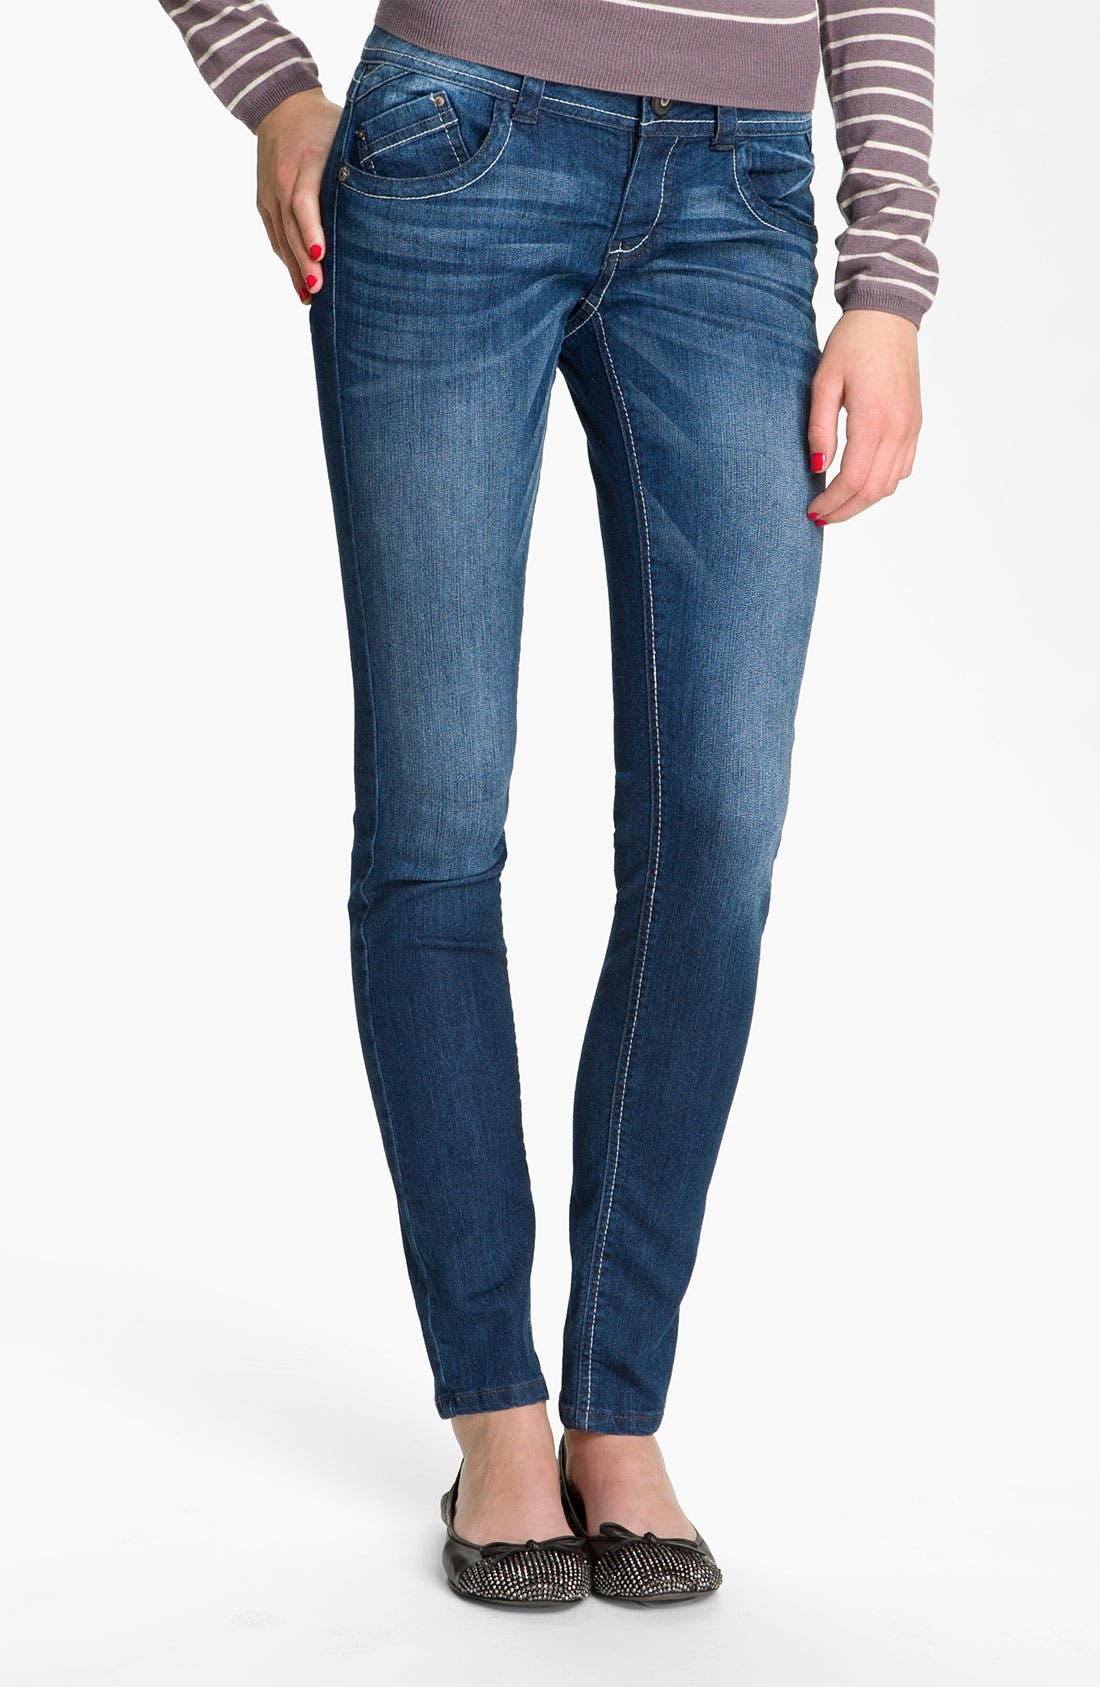 Alternate Image 1 Selected - Jolt 'J' Pocket Skinny Jeans (Juniors)